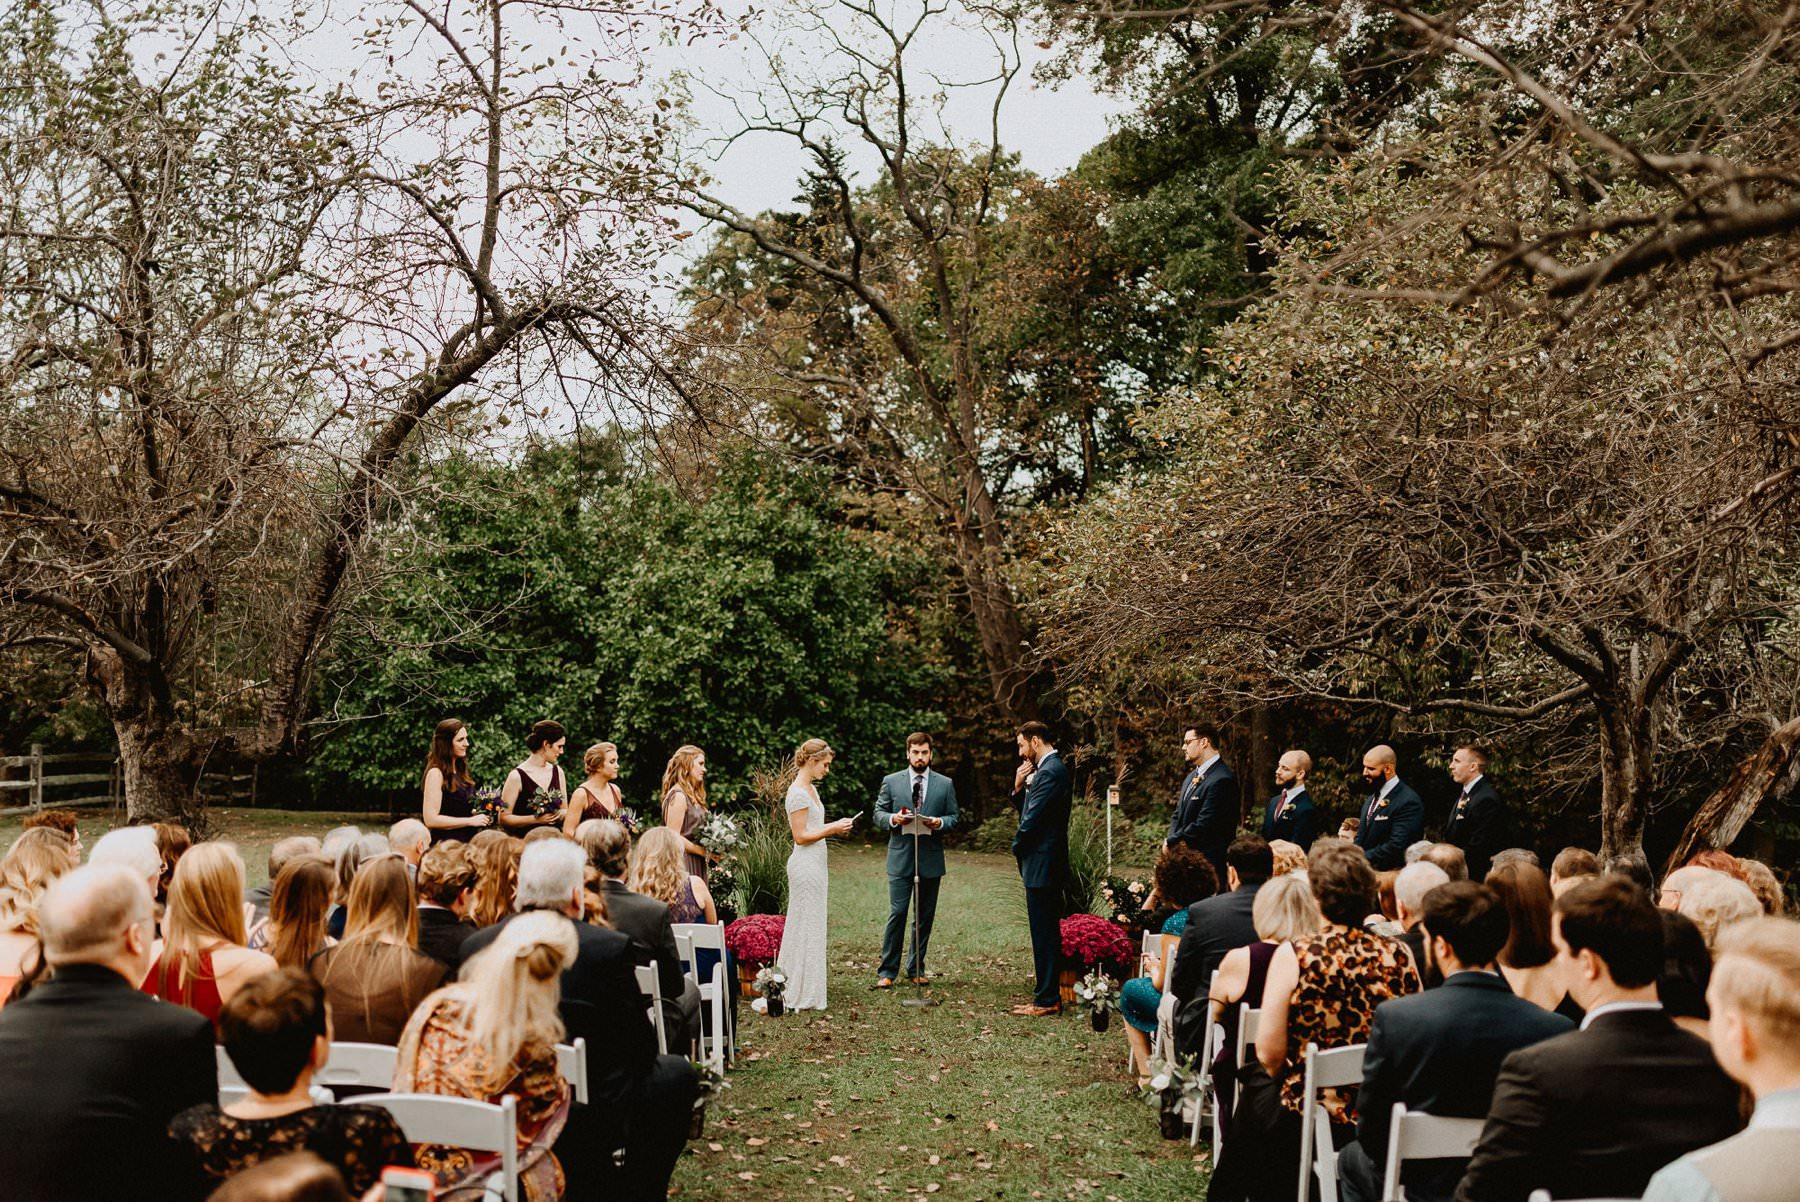 John_James_Audubon_Center_wedding-50.jpg